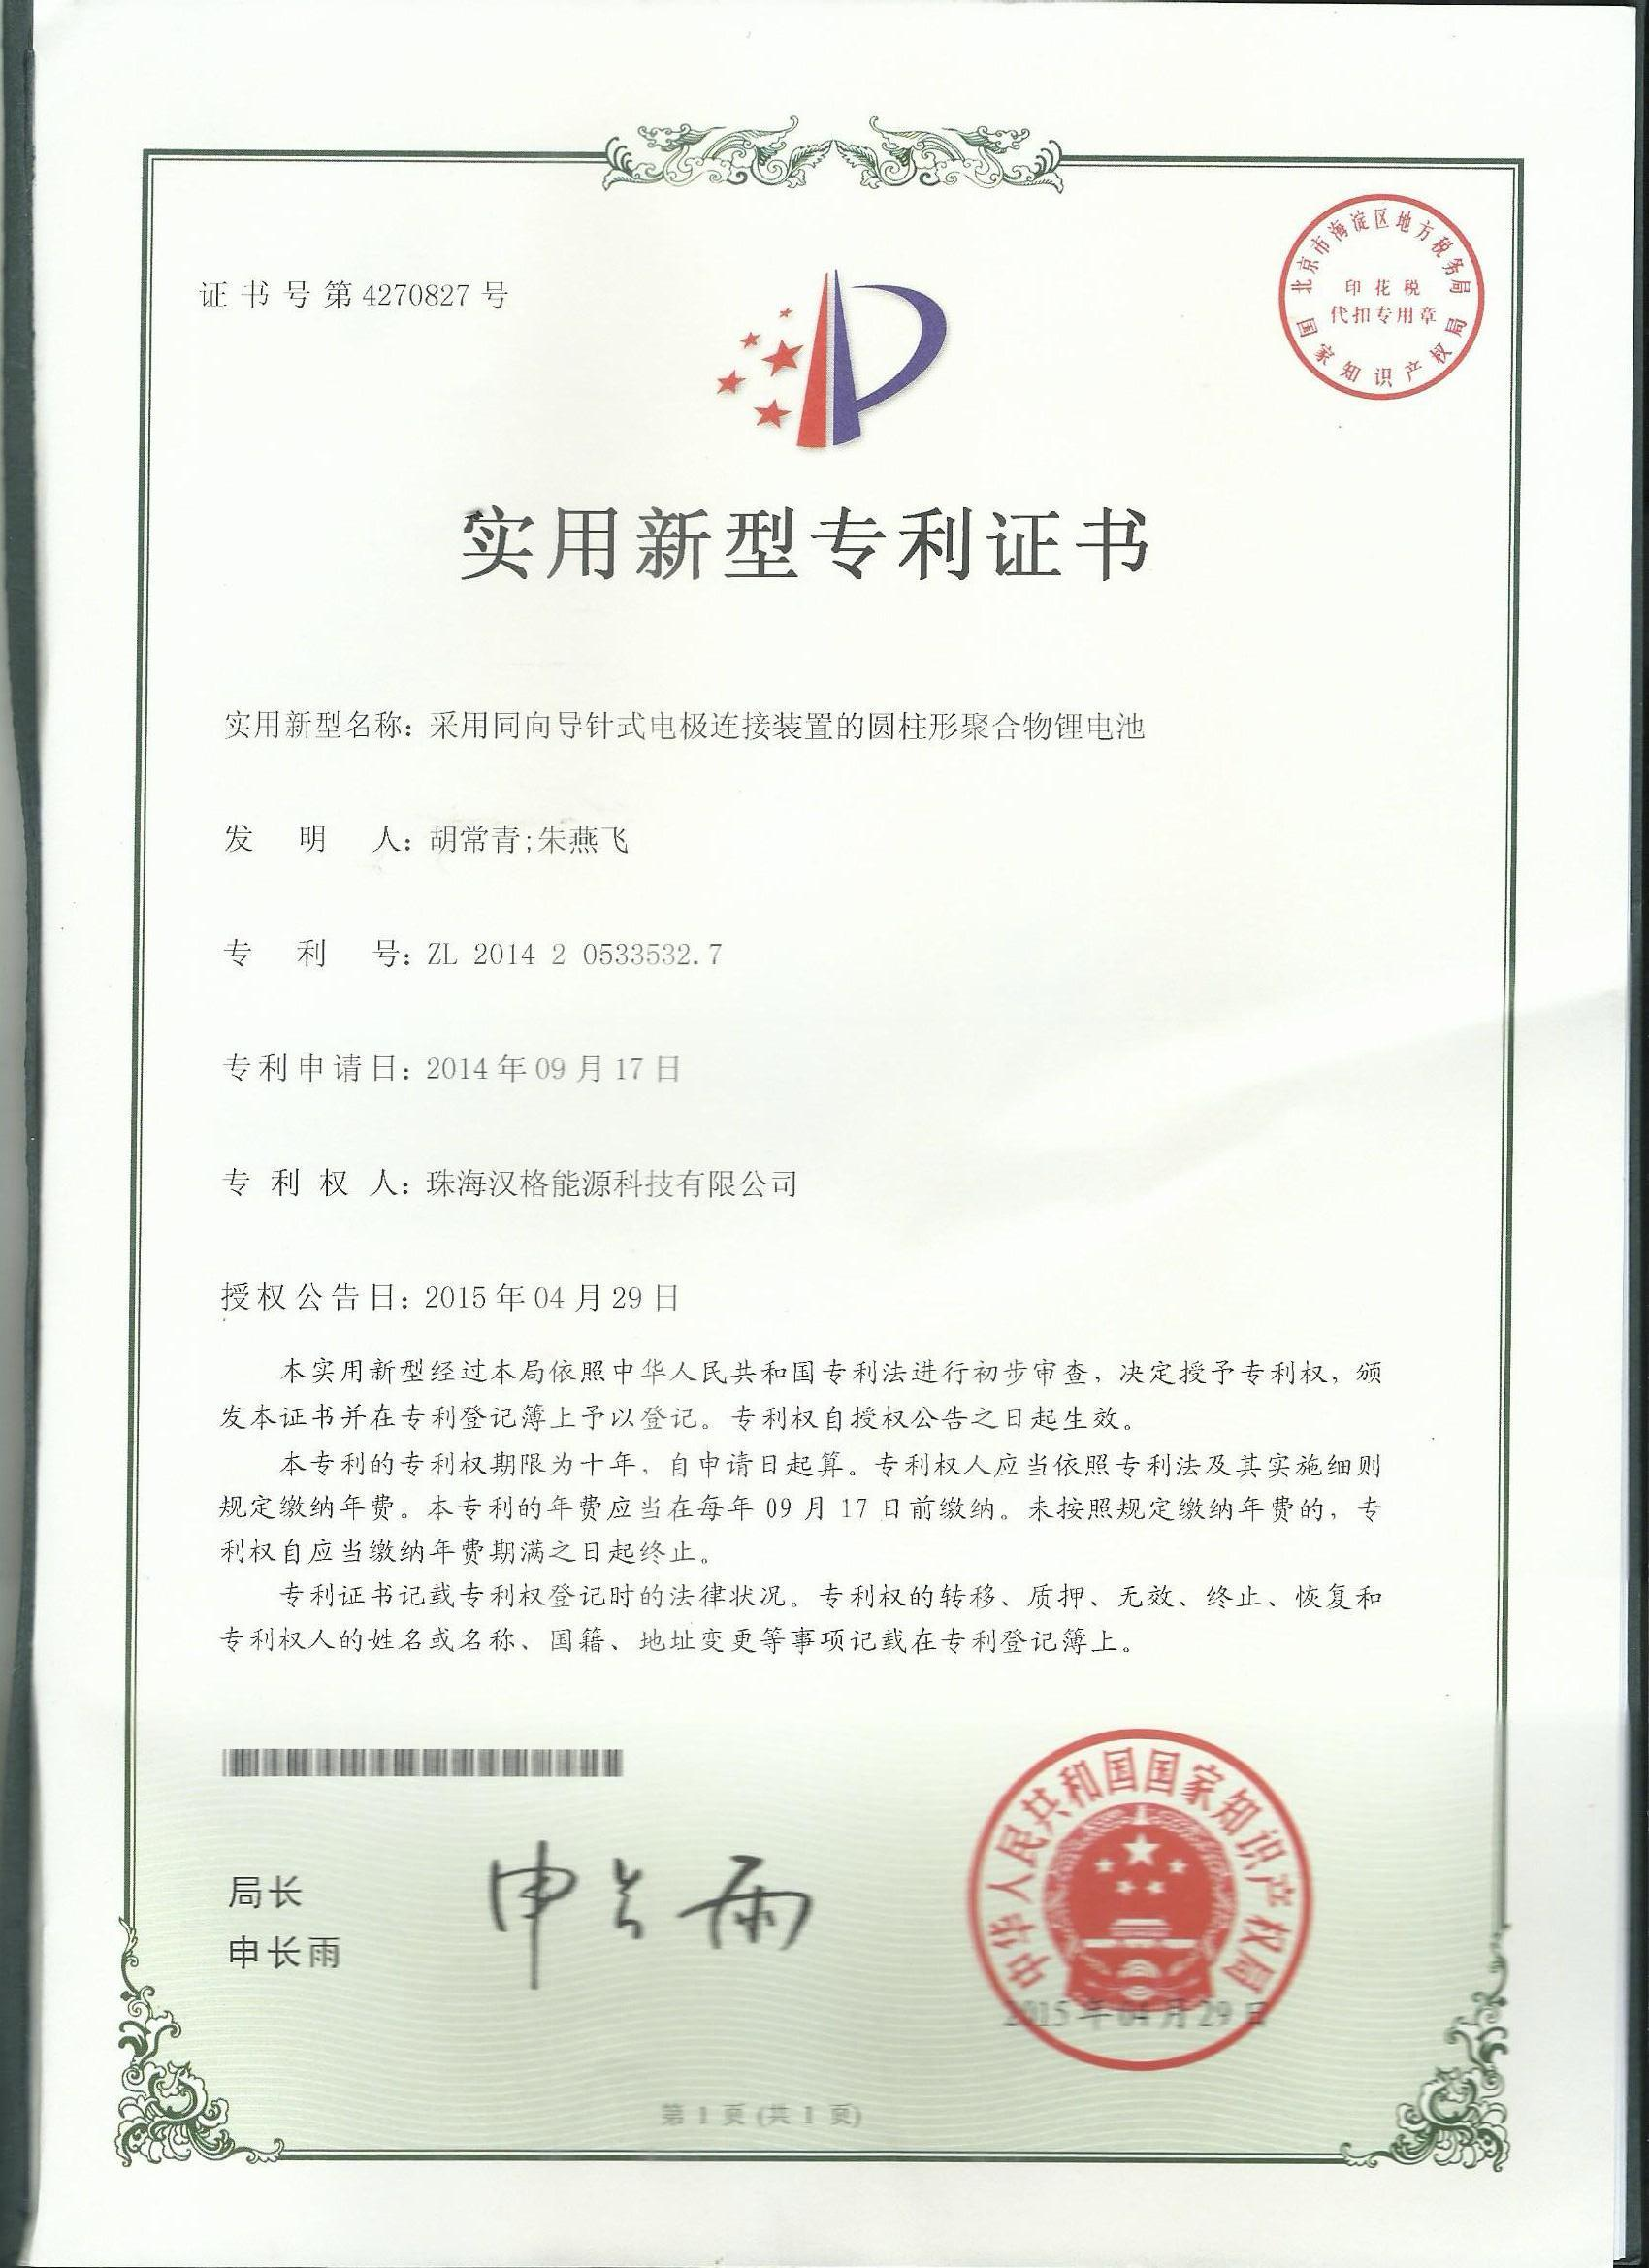 Appearance design patent certificate 1